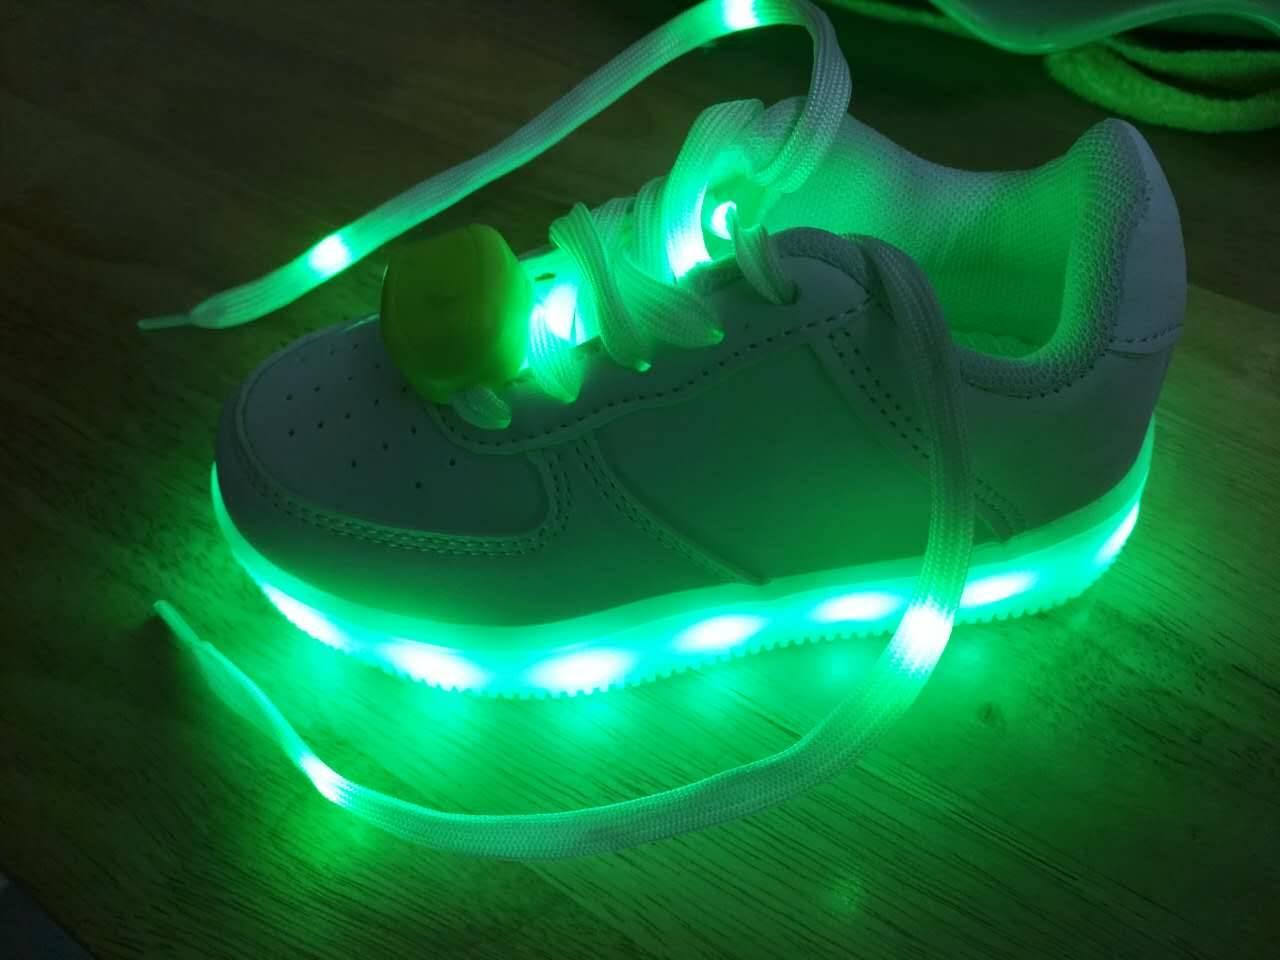 LED SHOES LIGHTS